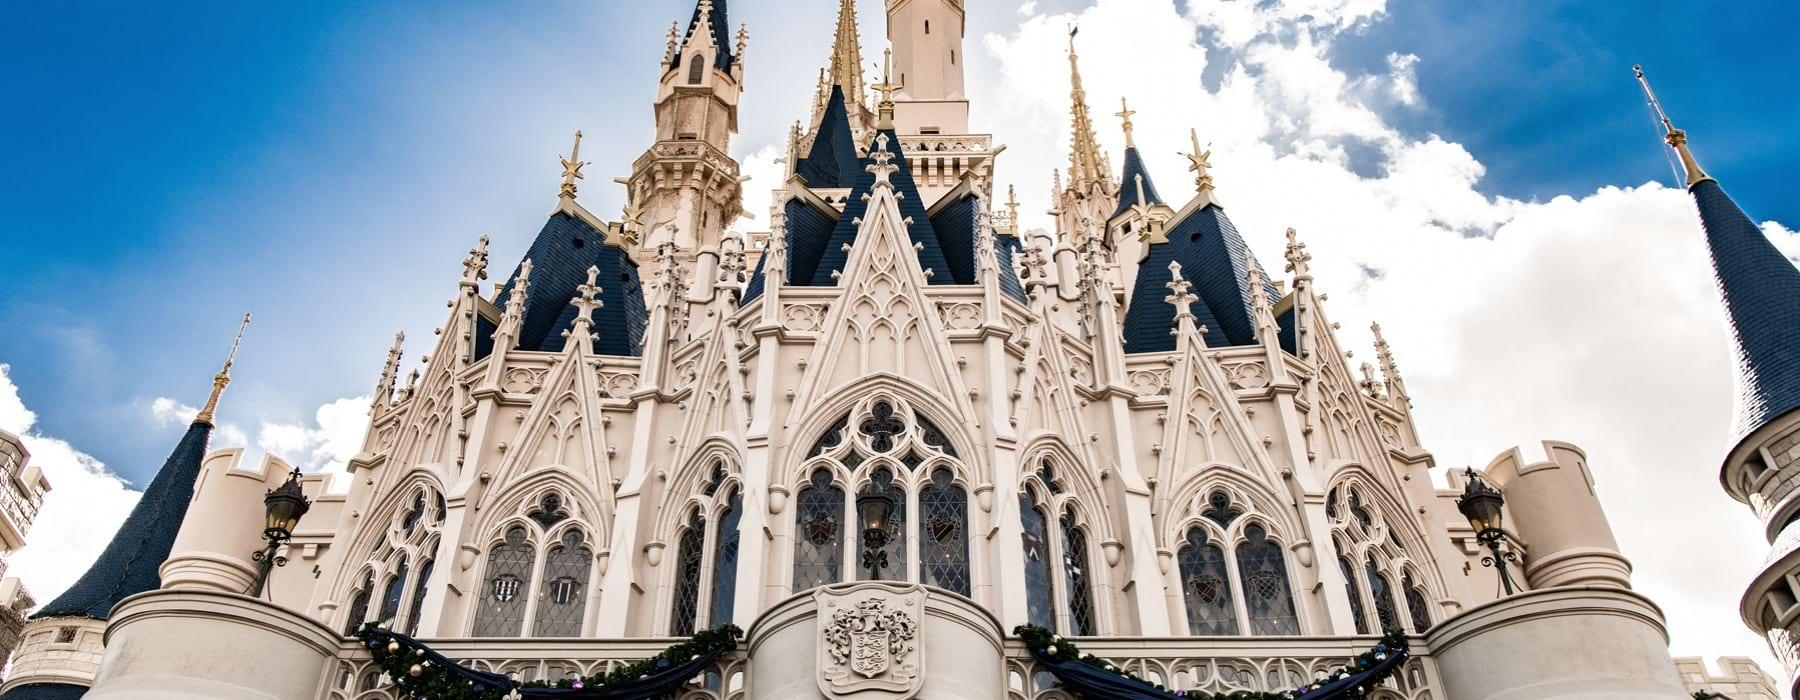 Imagen del castillo de Disney